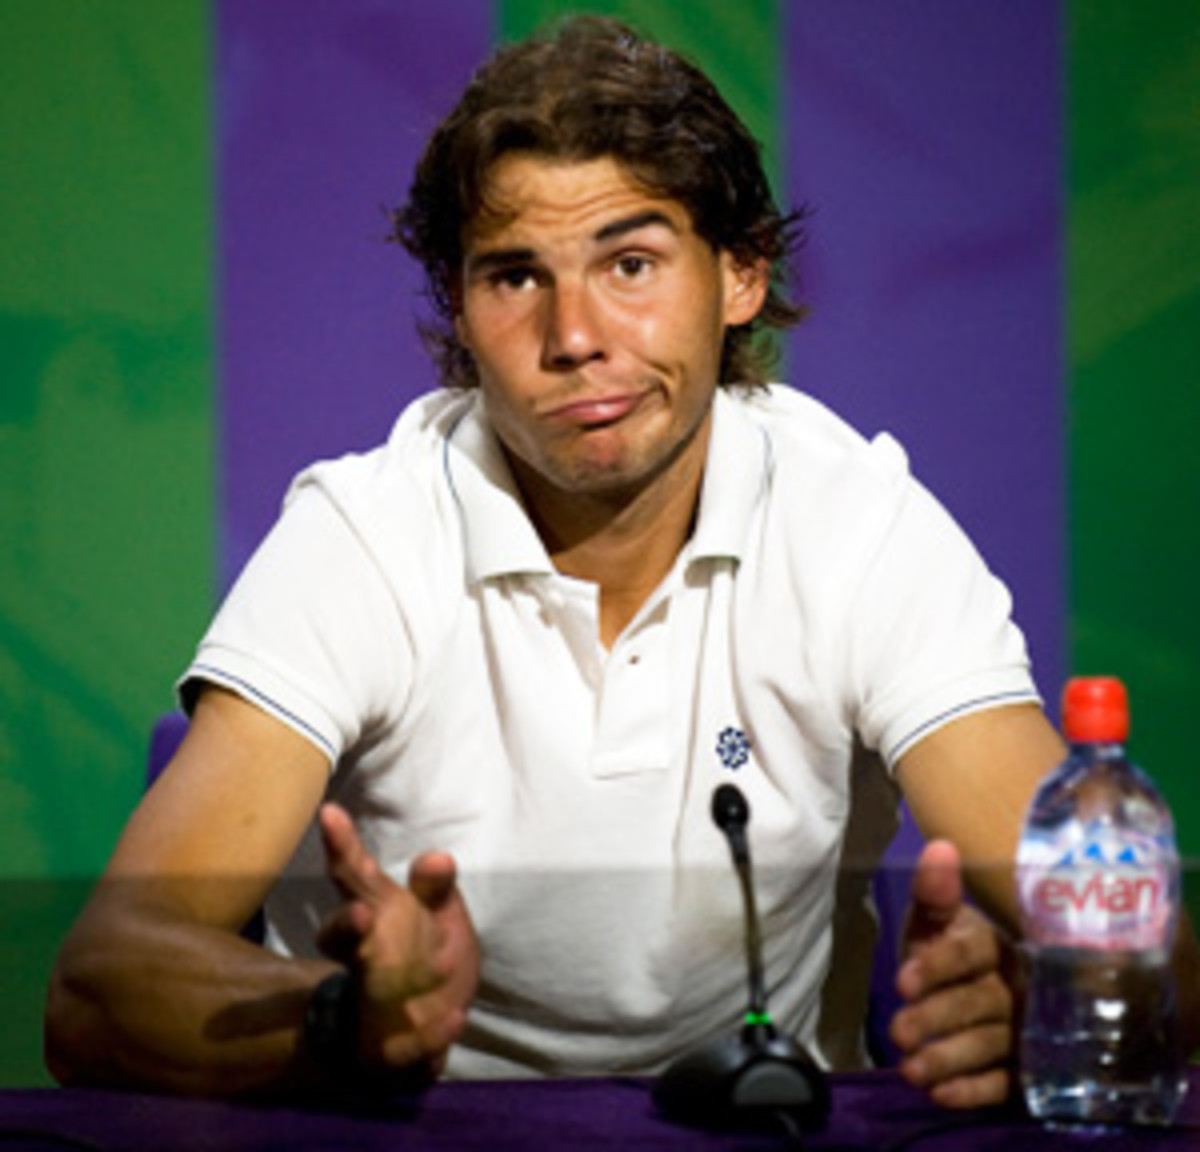 Rafael Nadal Wimbledon 2012